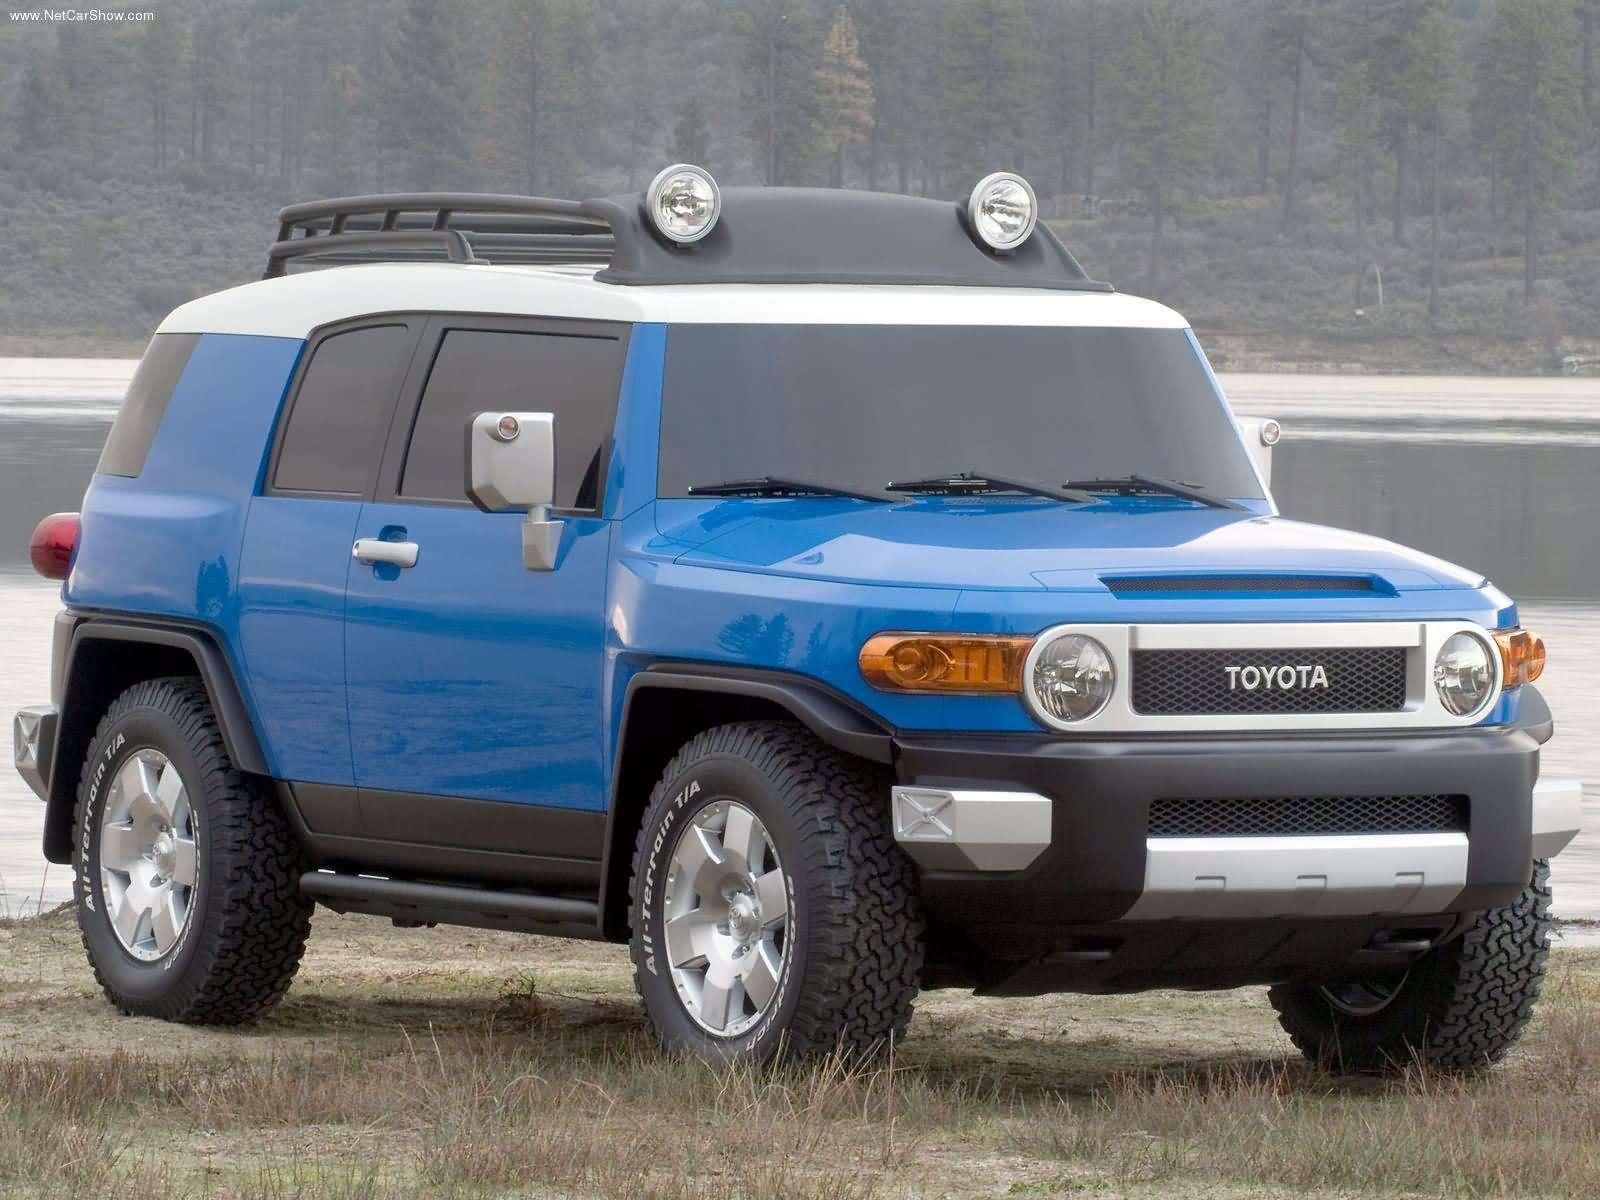 lexus and porsche top j d power 39 s vehicle dependability study carscoops. Black Bedroom Furniture Sets. Home Design Ideas